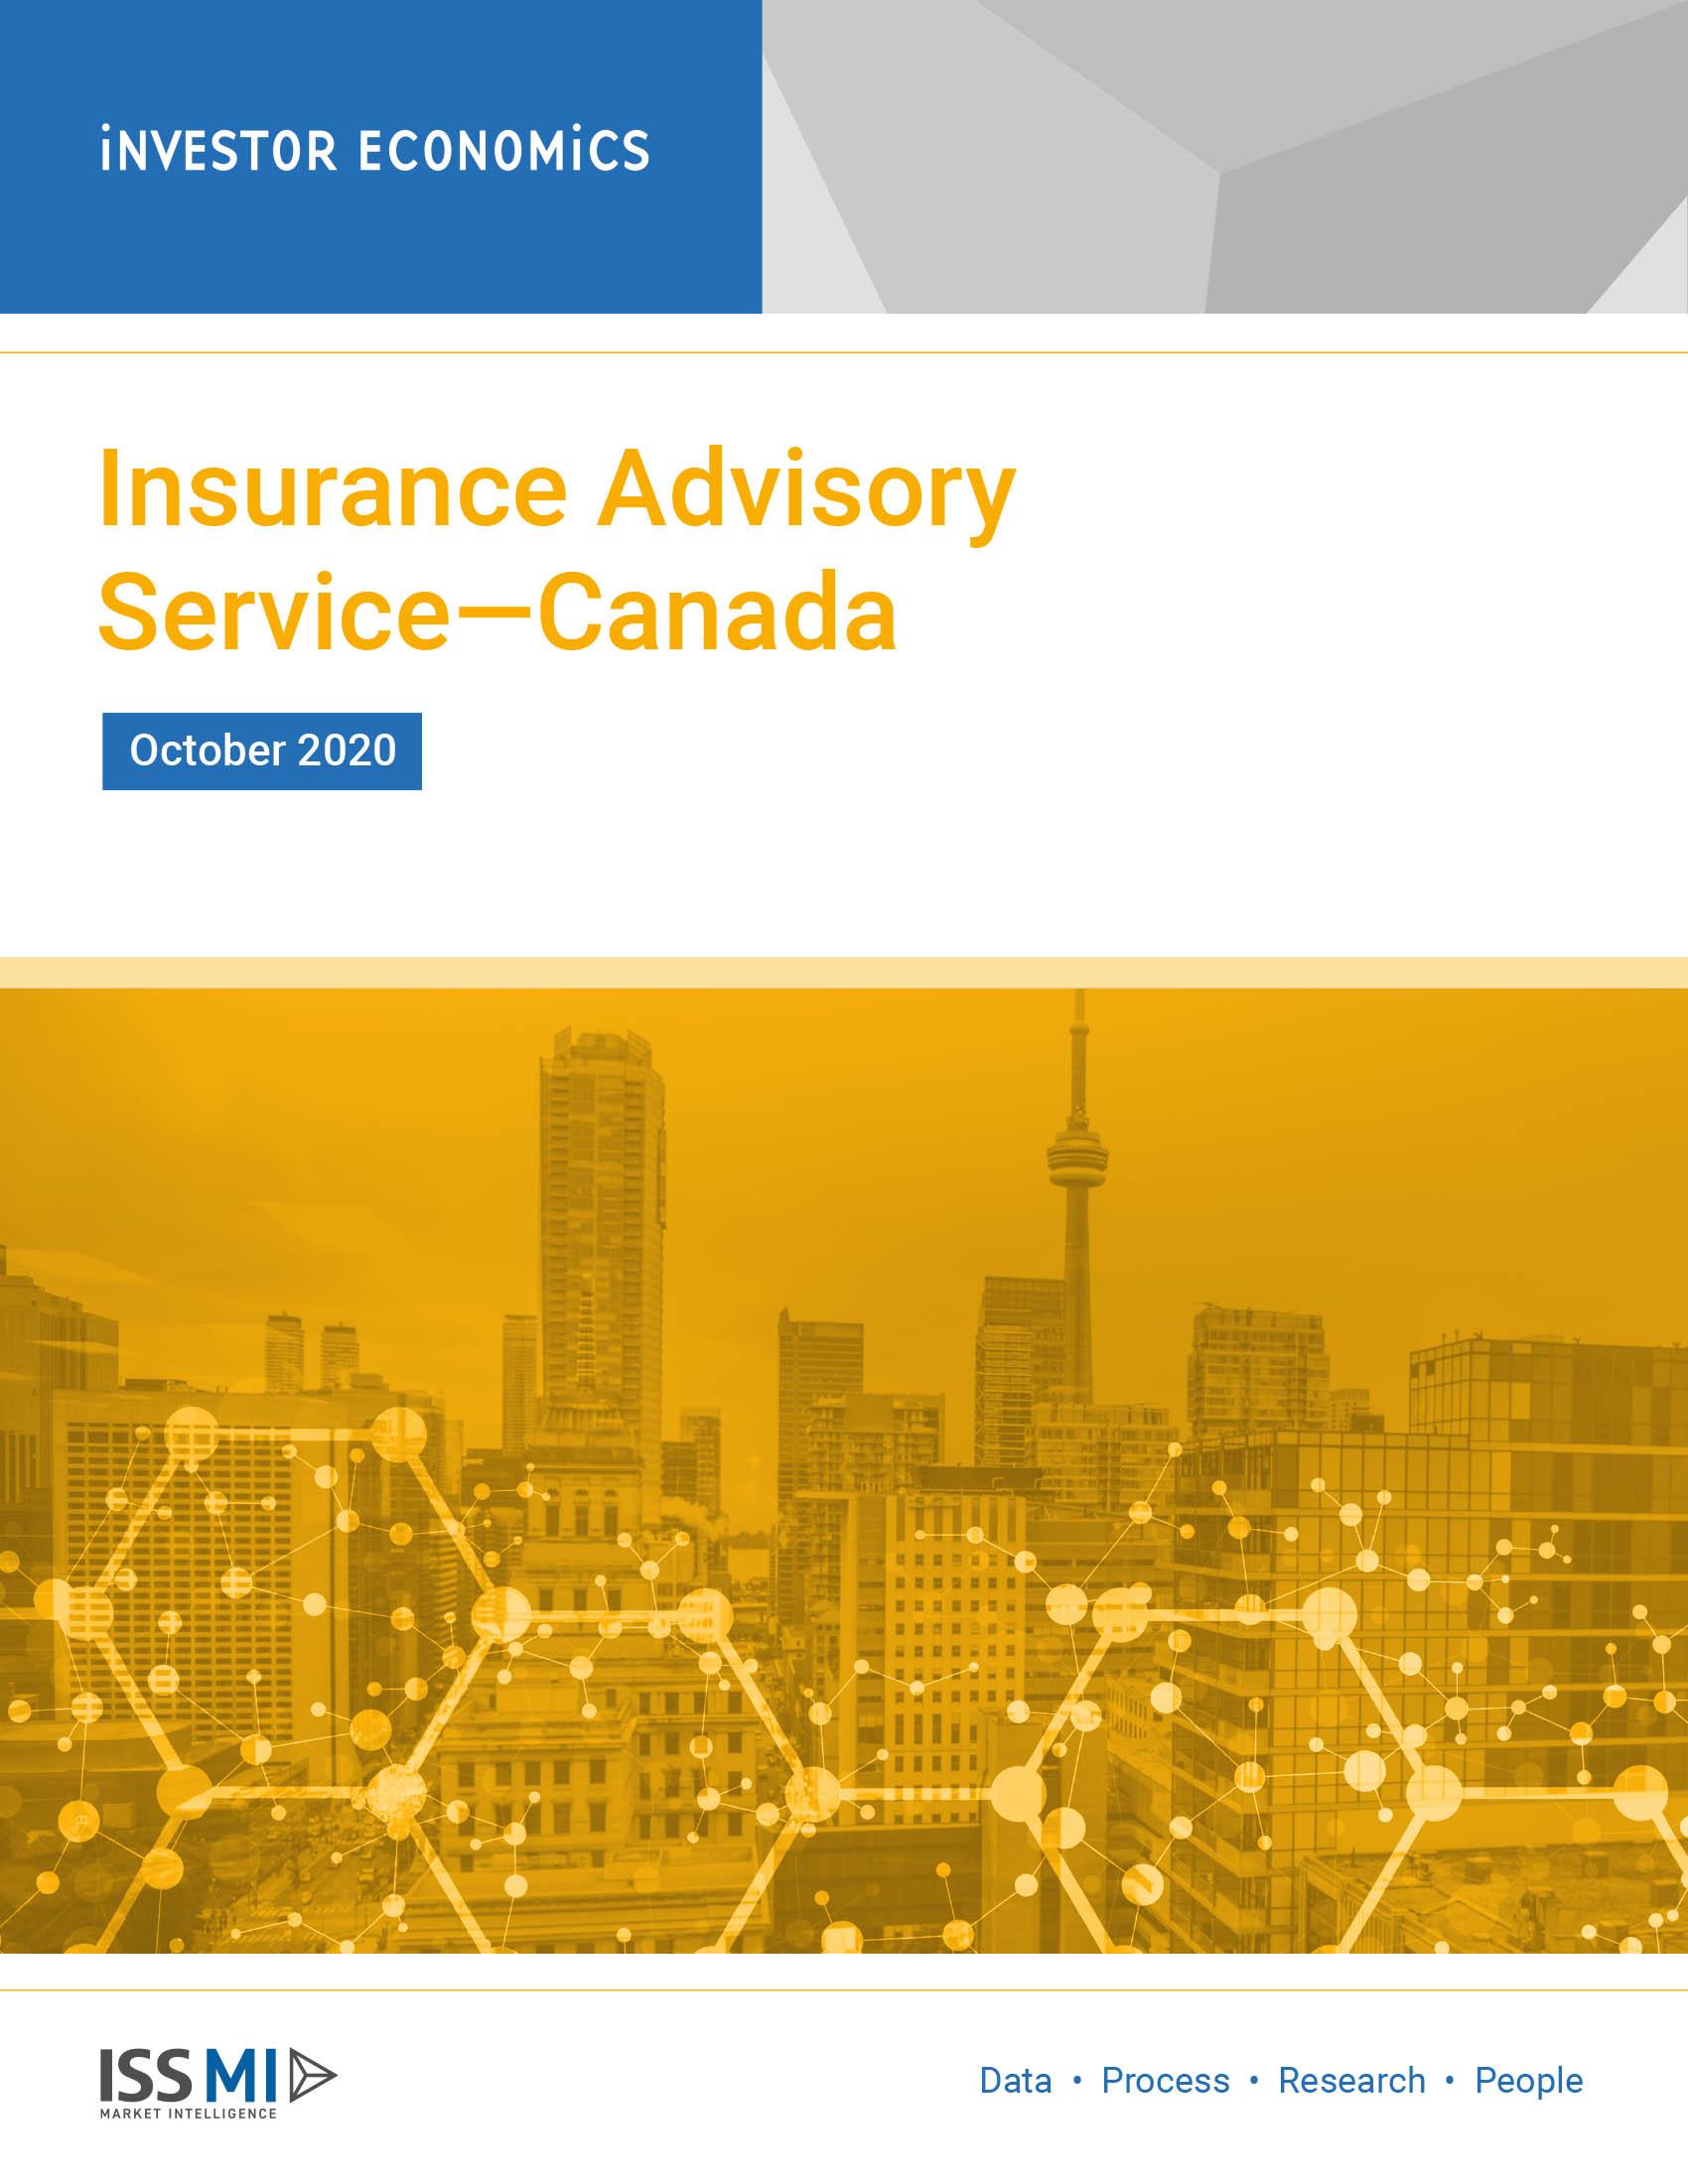 Insurance Advisory Service October 2020